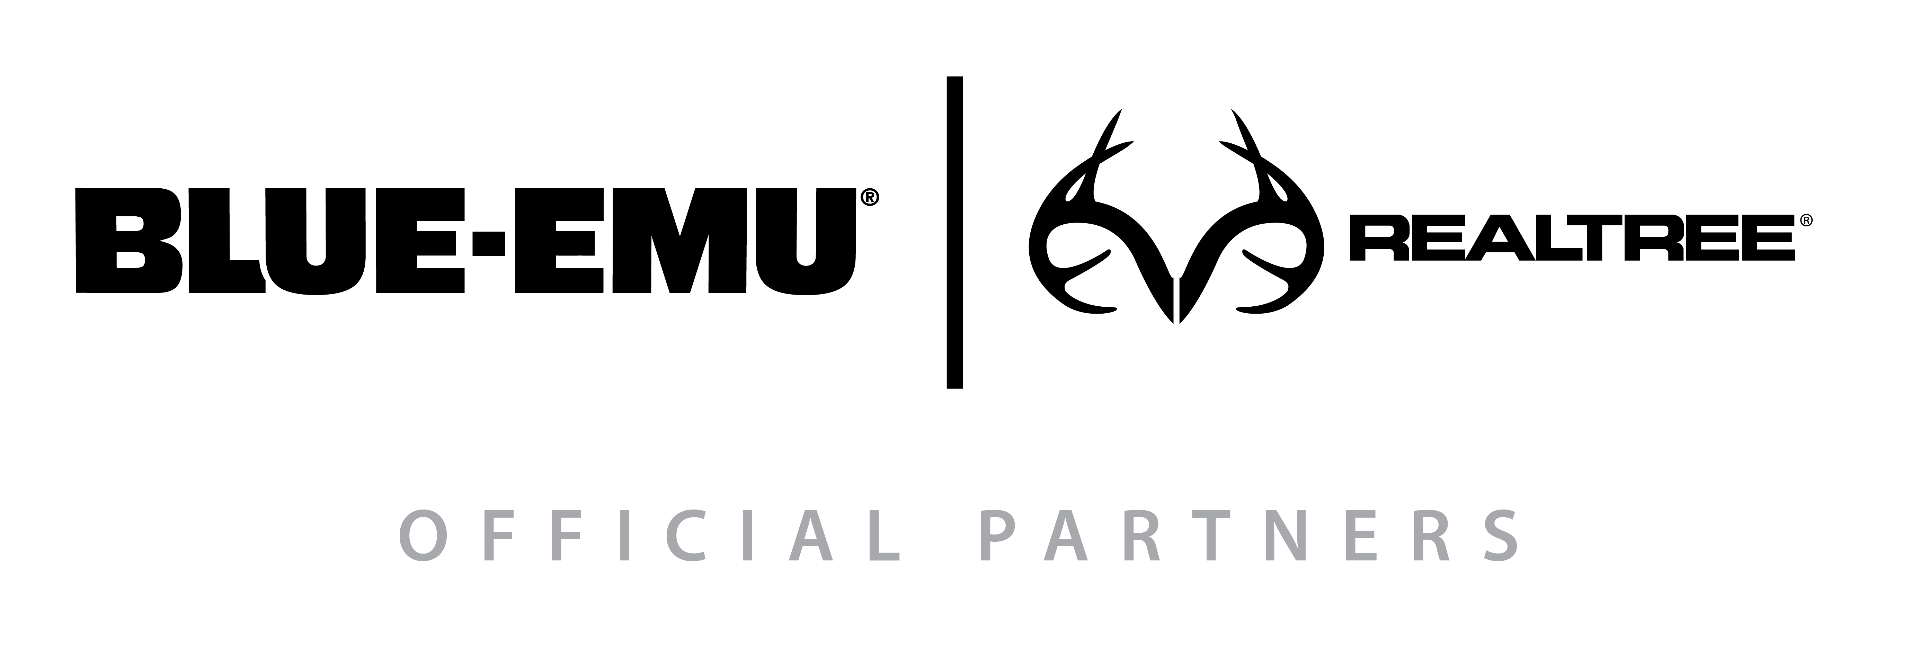 Blue-Emu and Realtree logos for Realtree Partnership